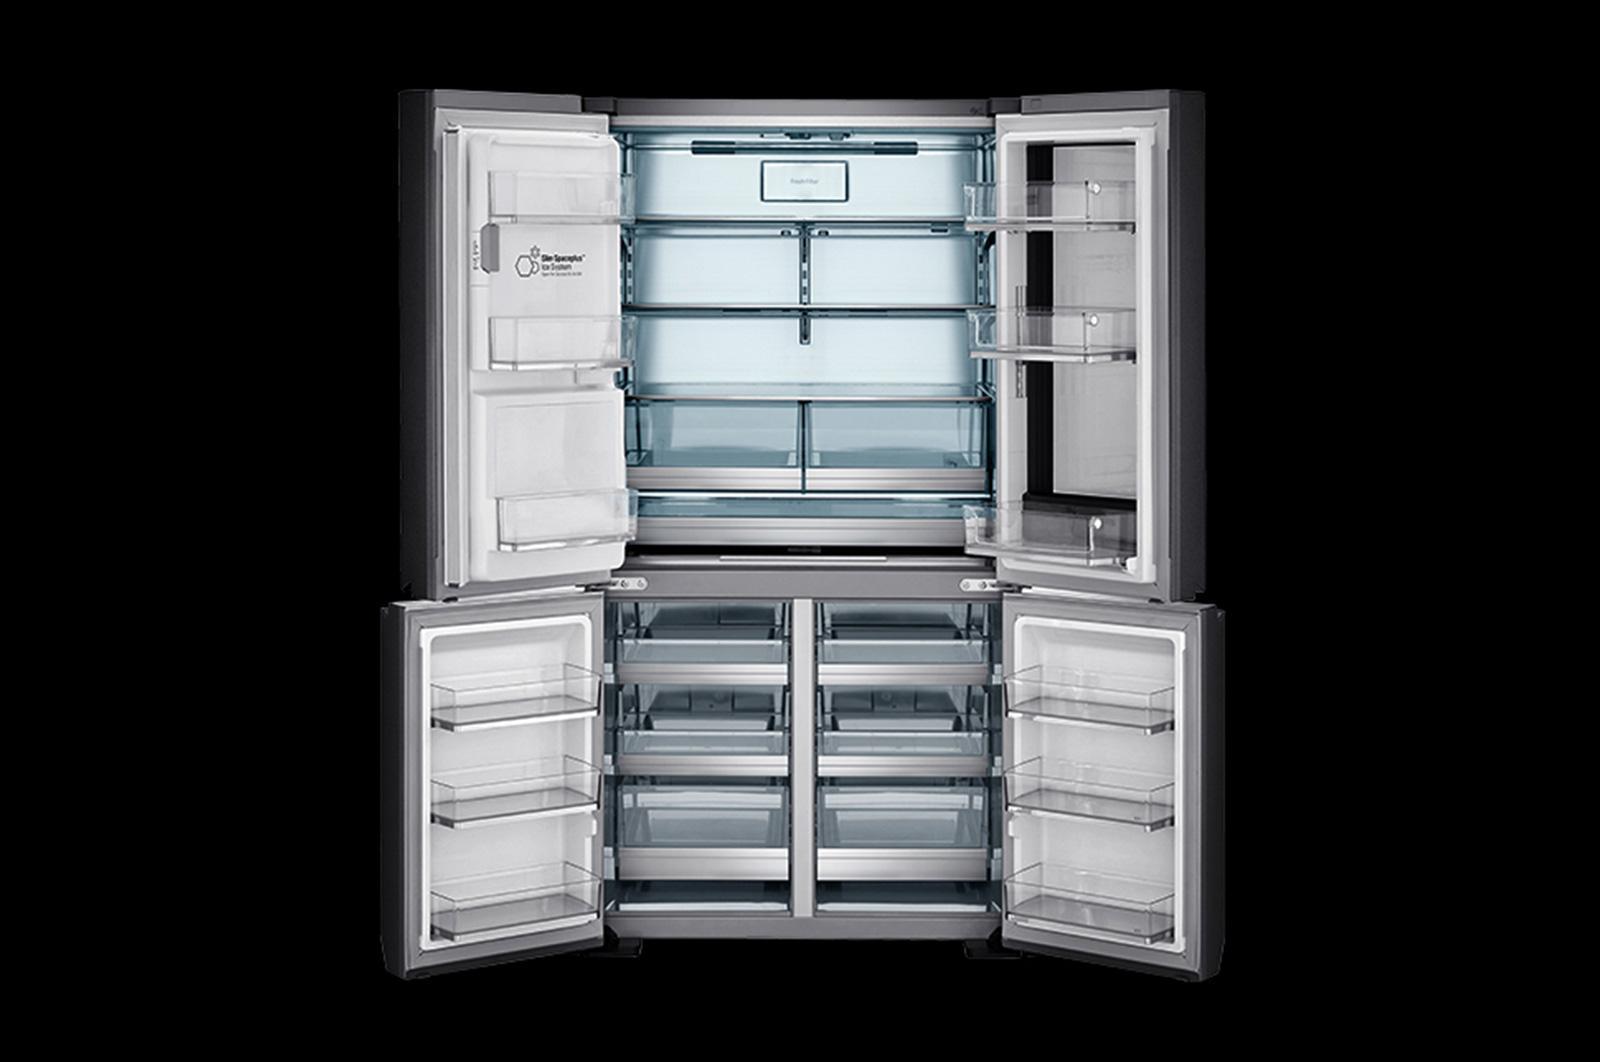 Lg Lupxs3186n Instaview Door In Smart Refrigerator Usa Fridge Alarm Circuit Diagram